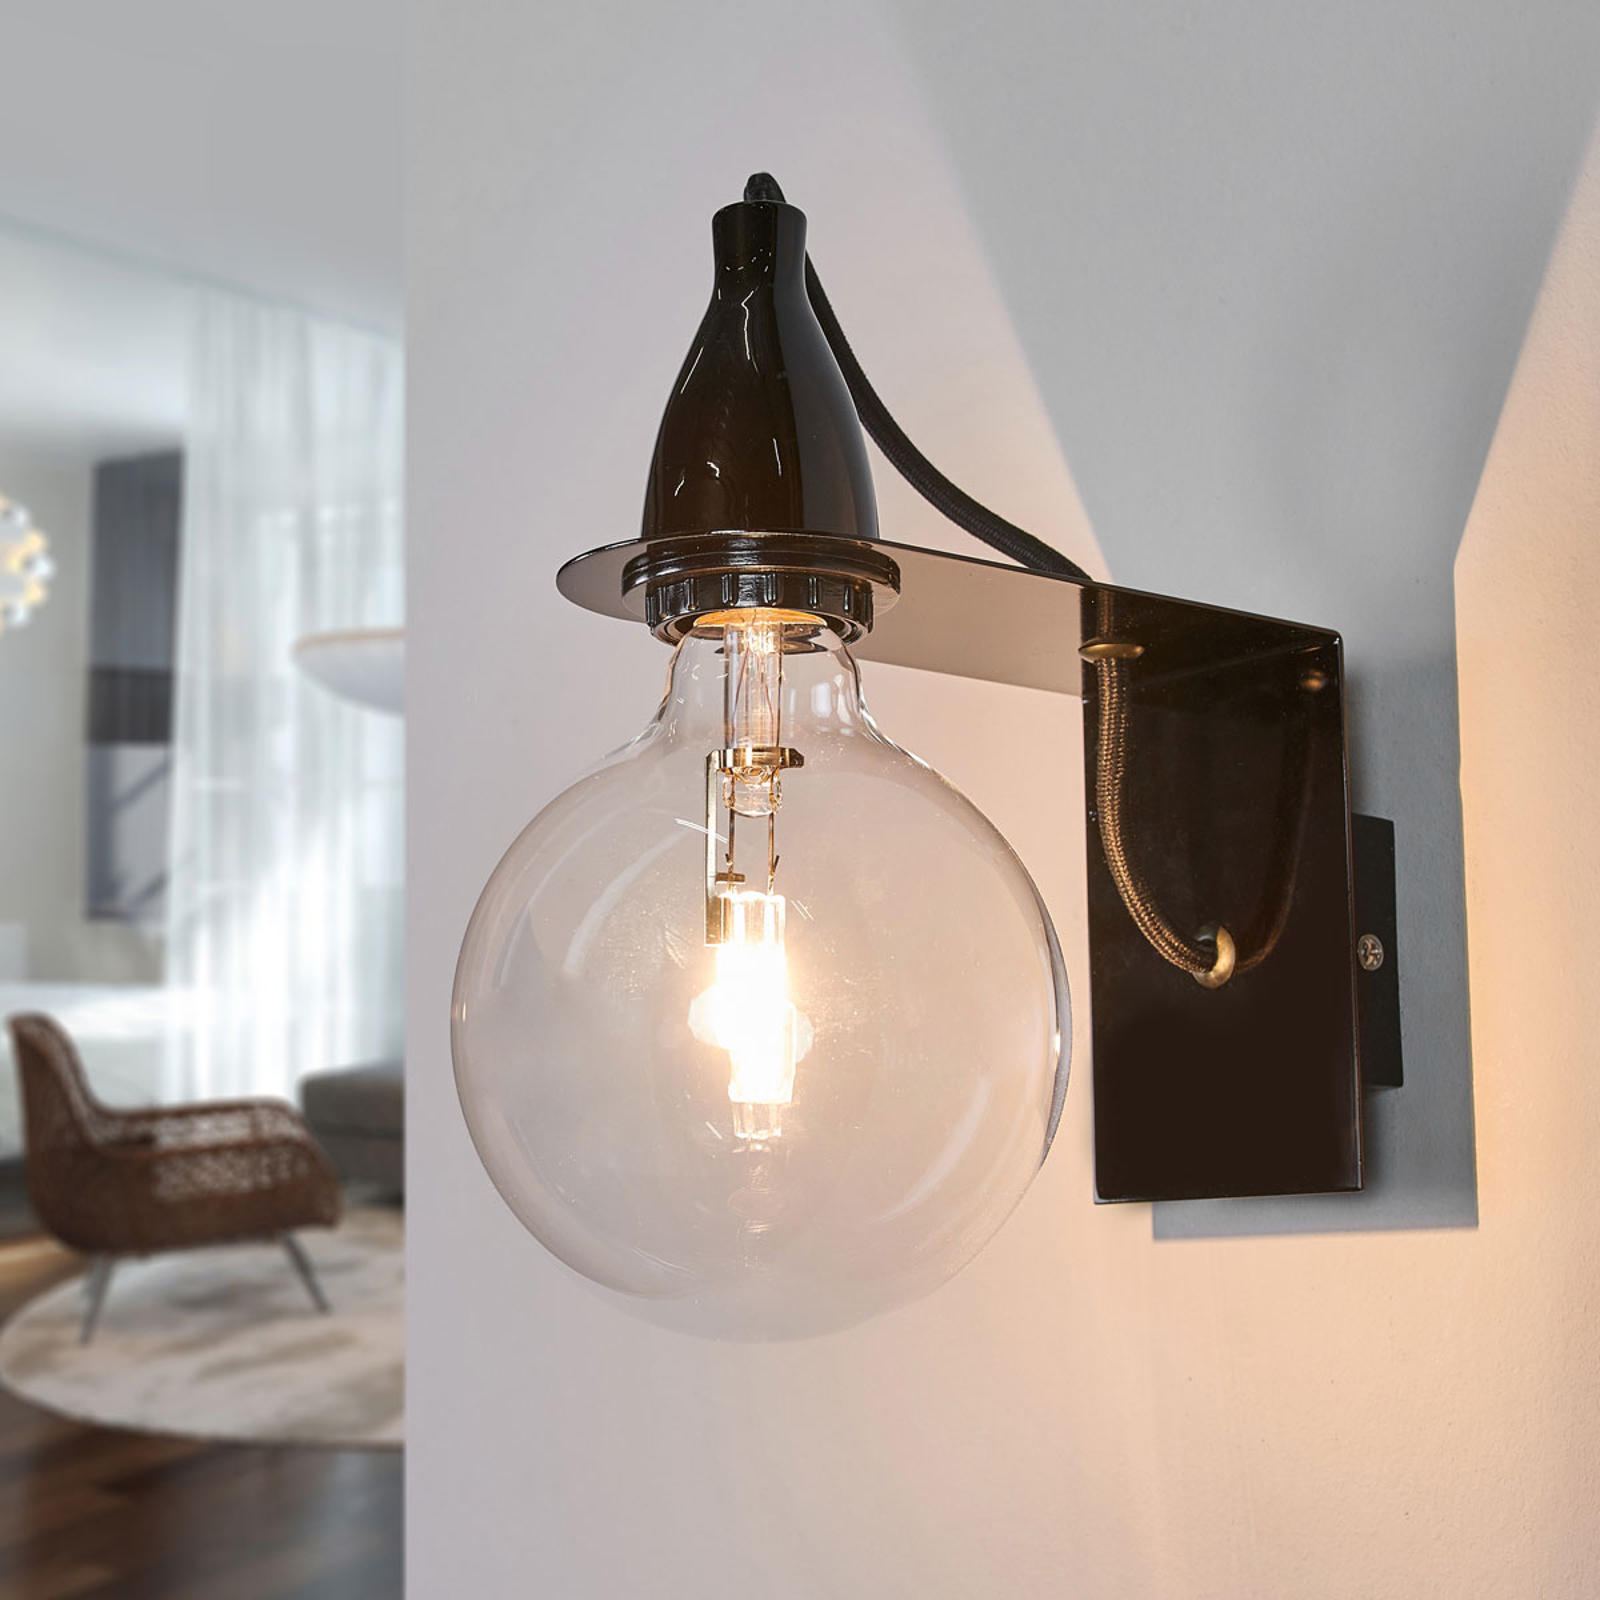 Schwarze Design-Wandlampe Minimal